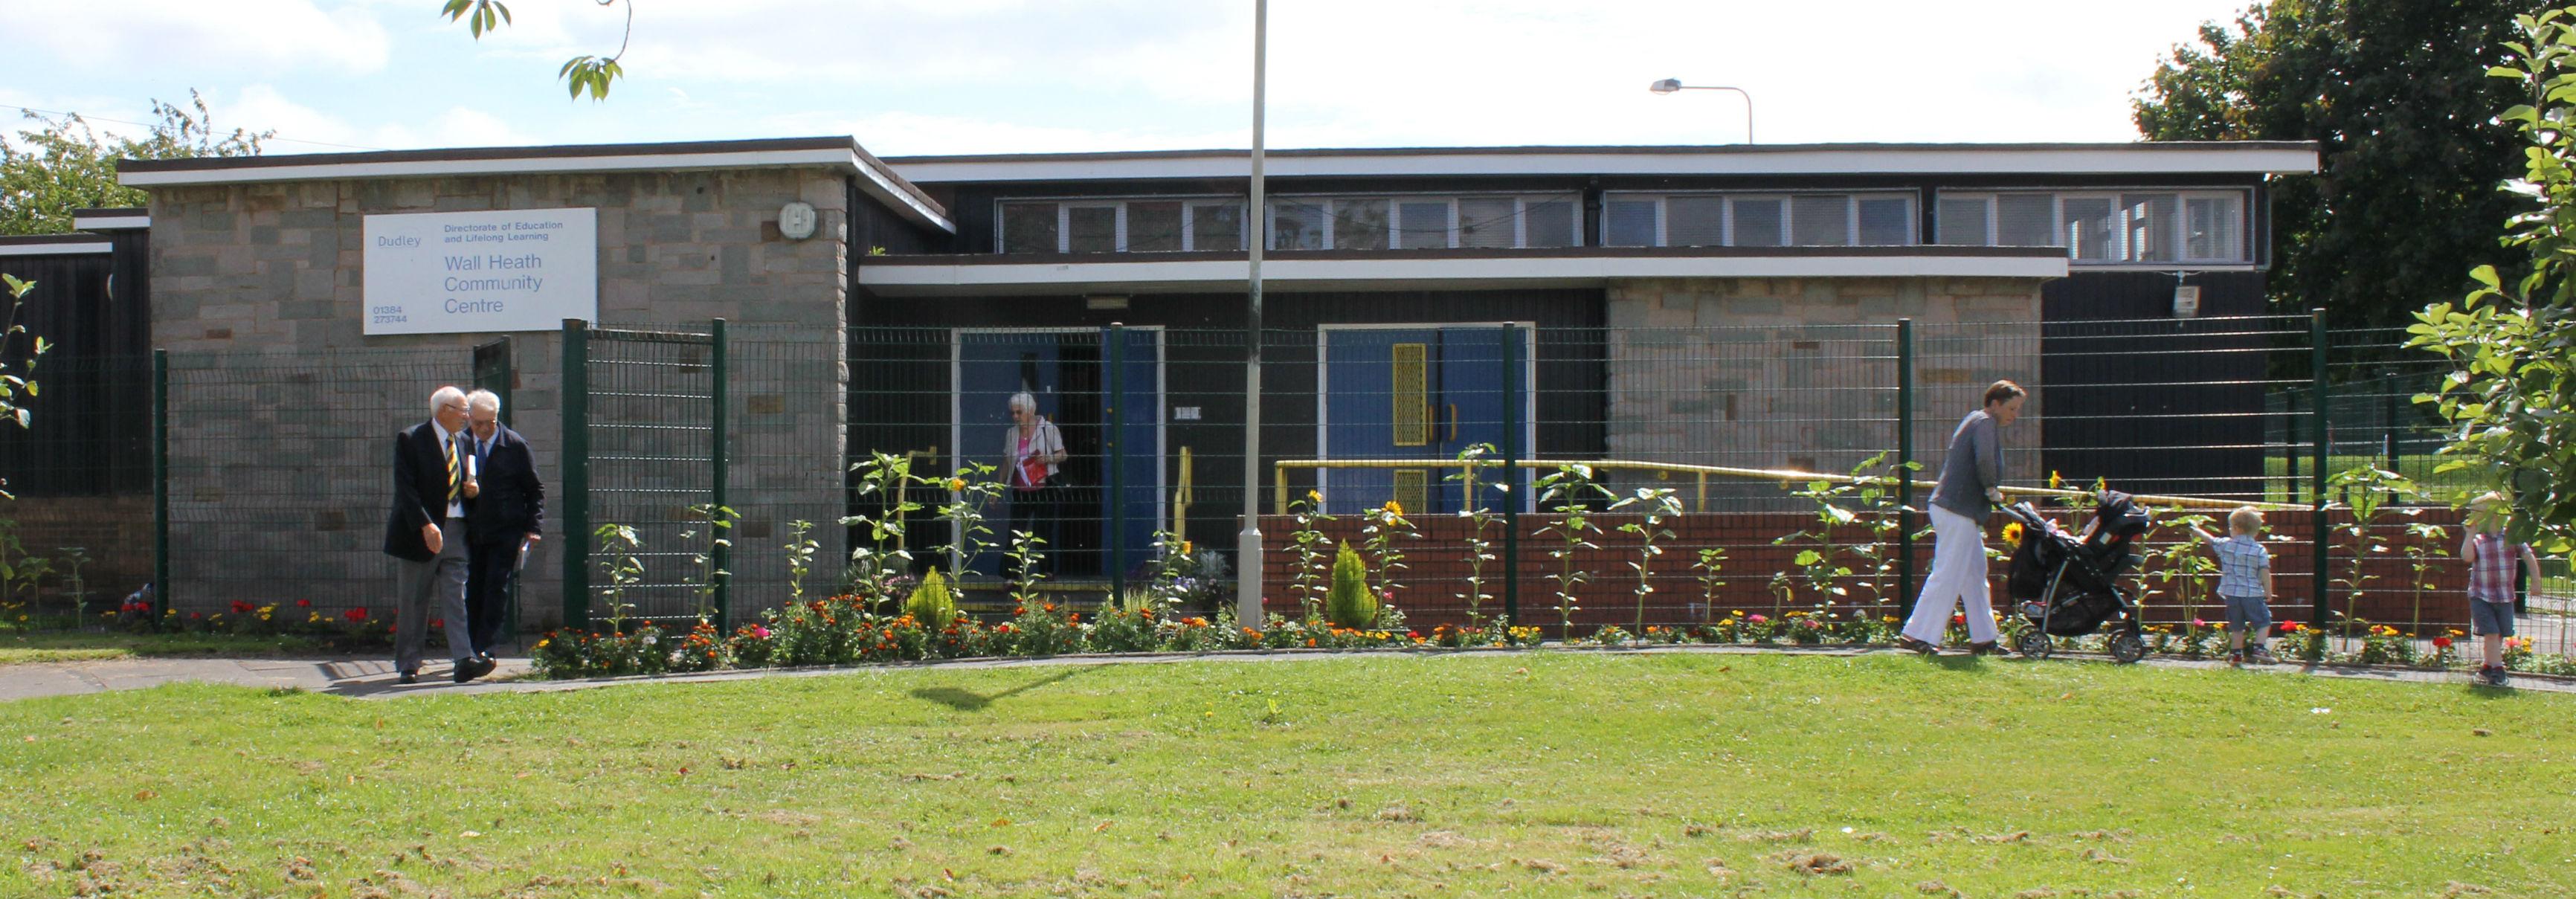 Wall Heath Community Centre